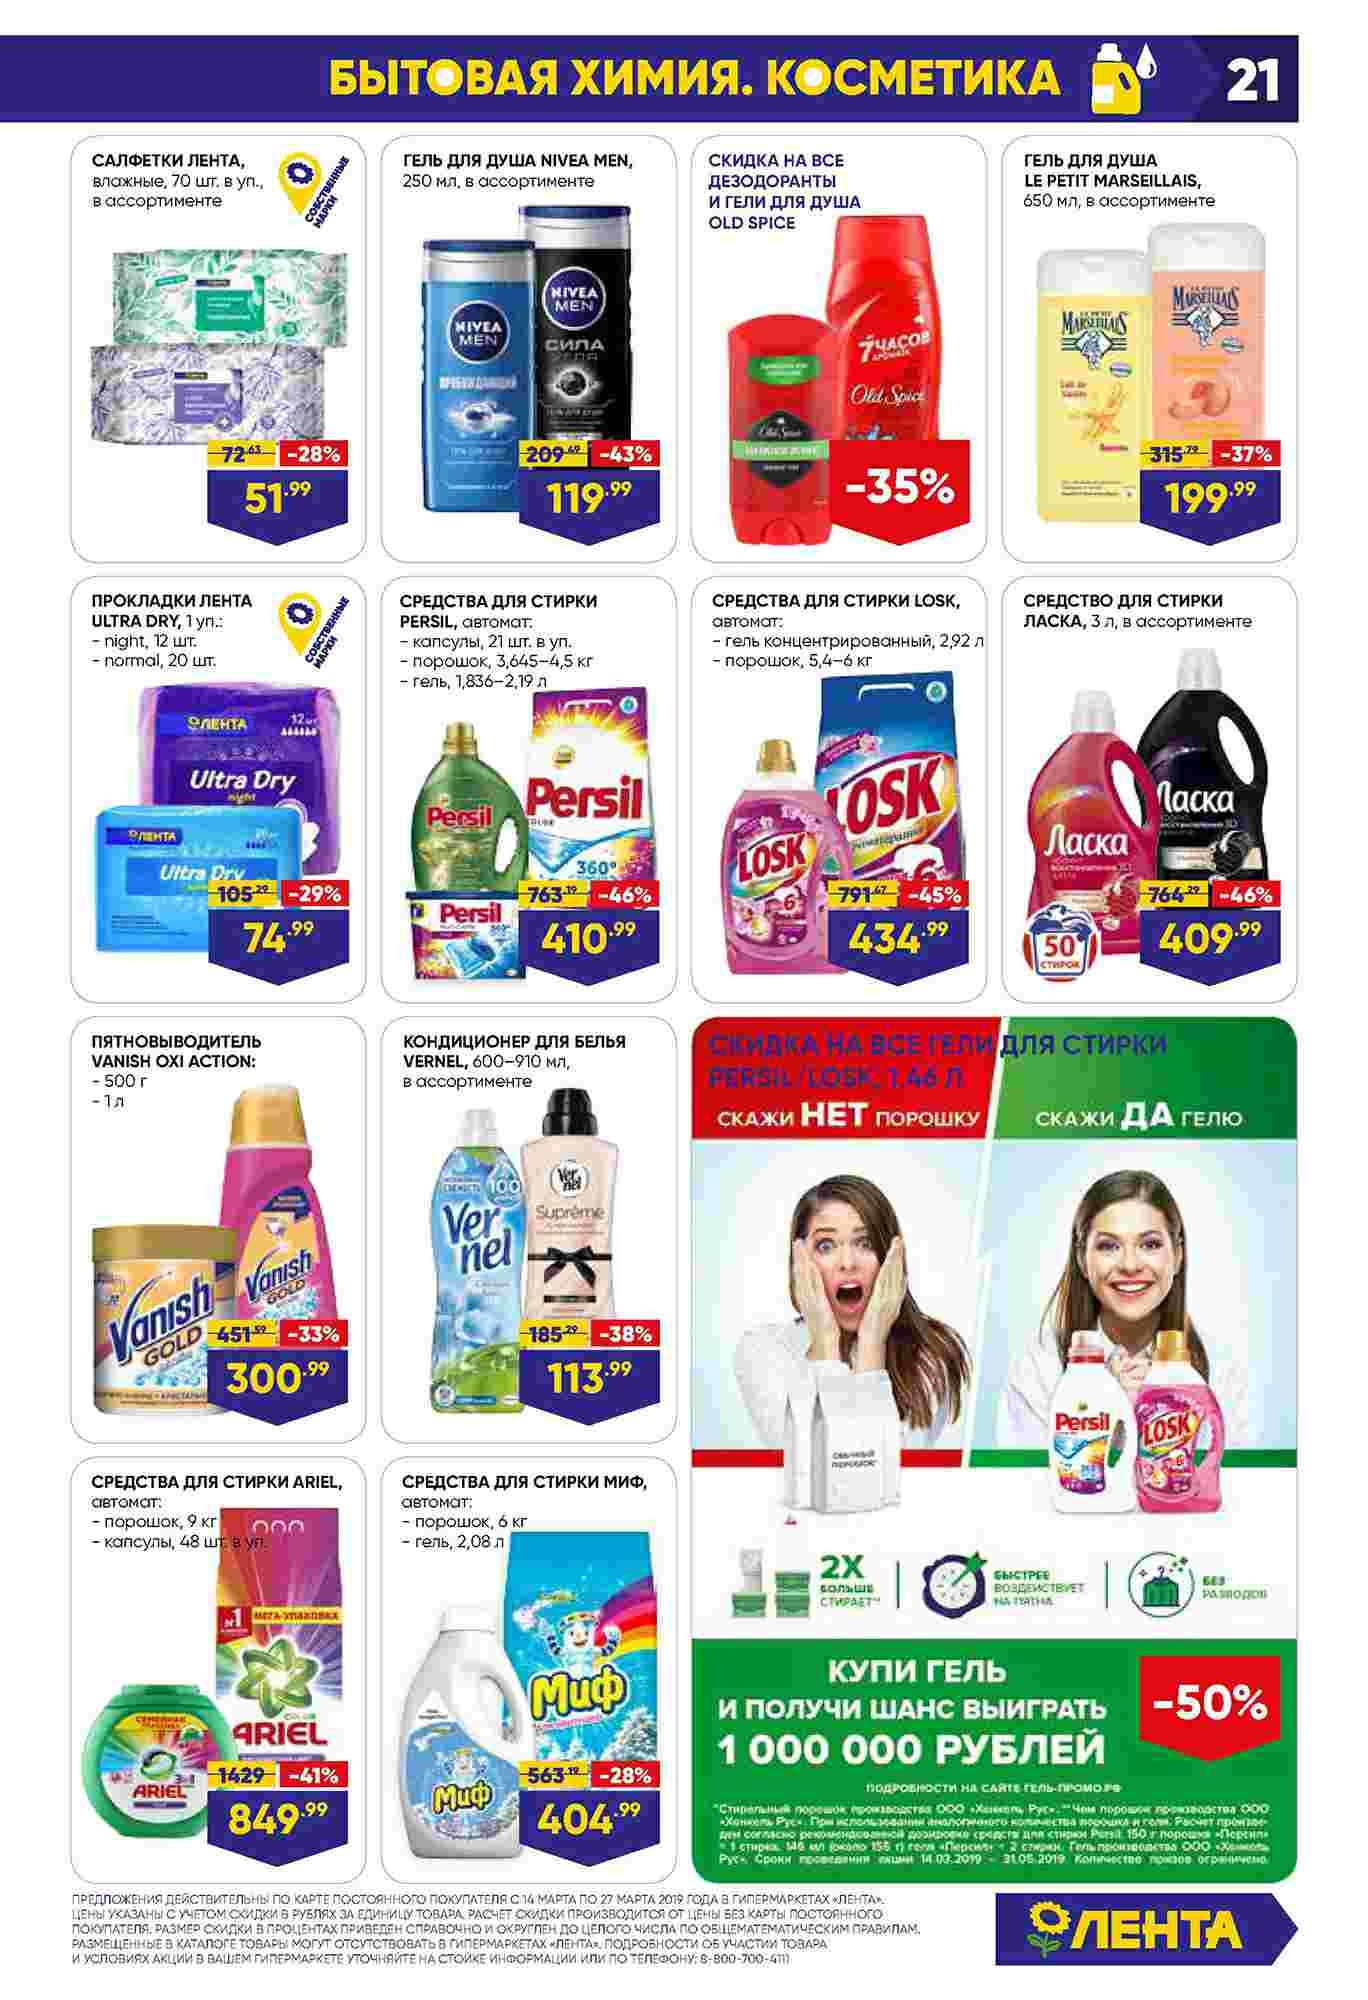 Каталог Лента гипермаркет 14-27.03.2019 стр. - 0001 - 0021